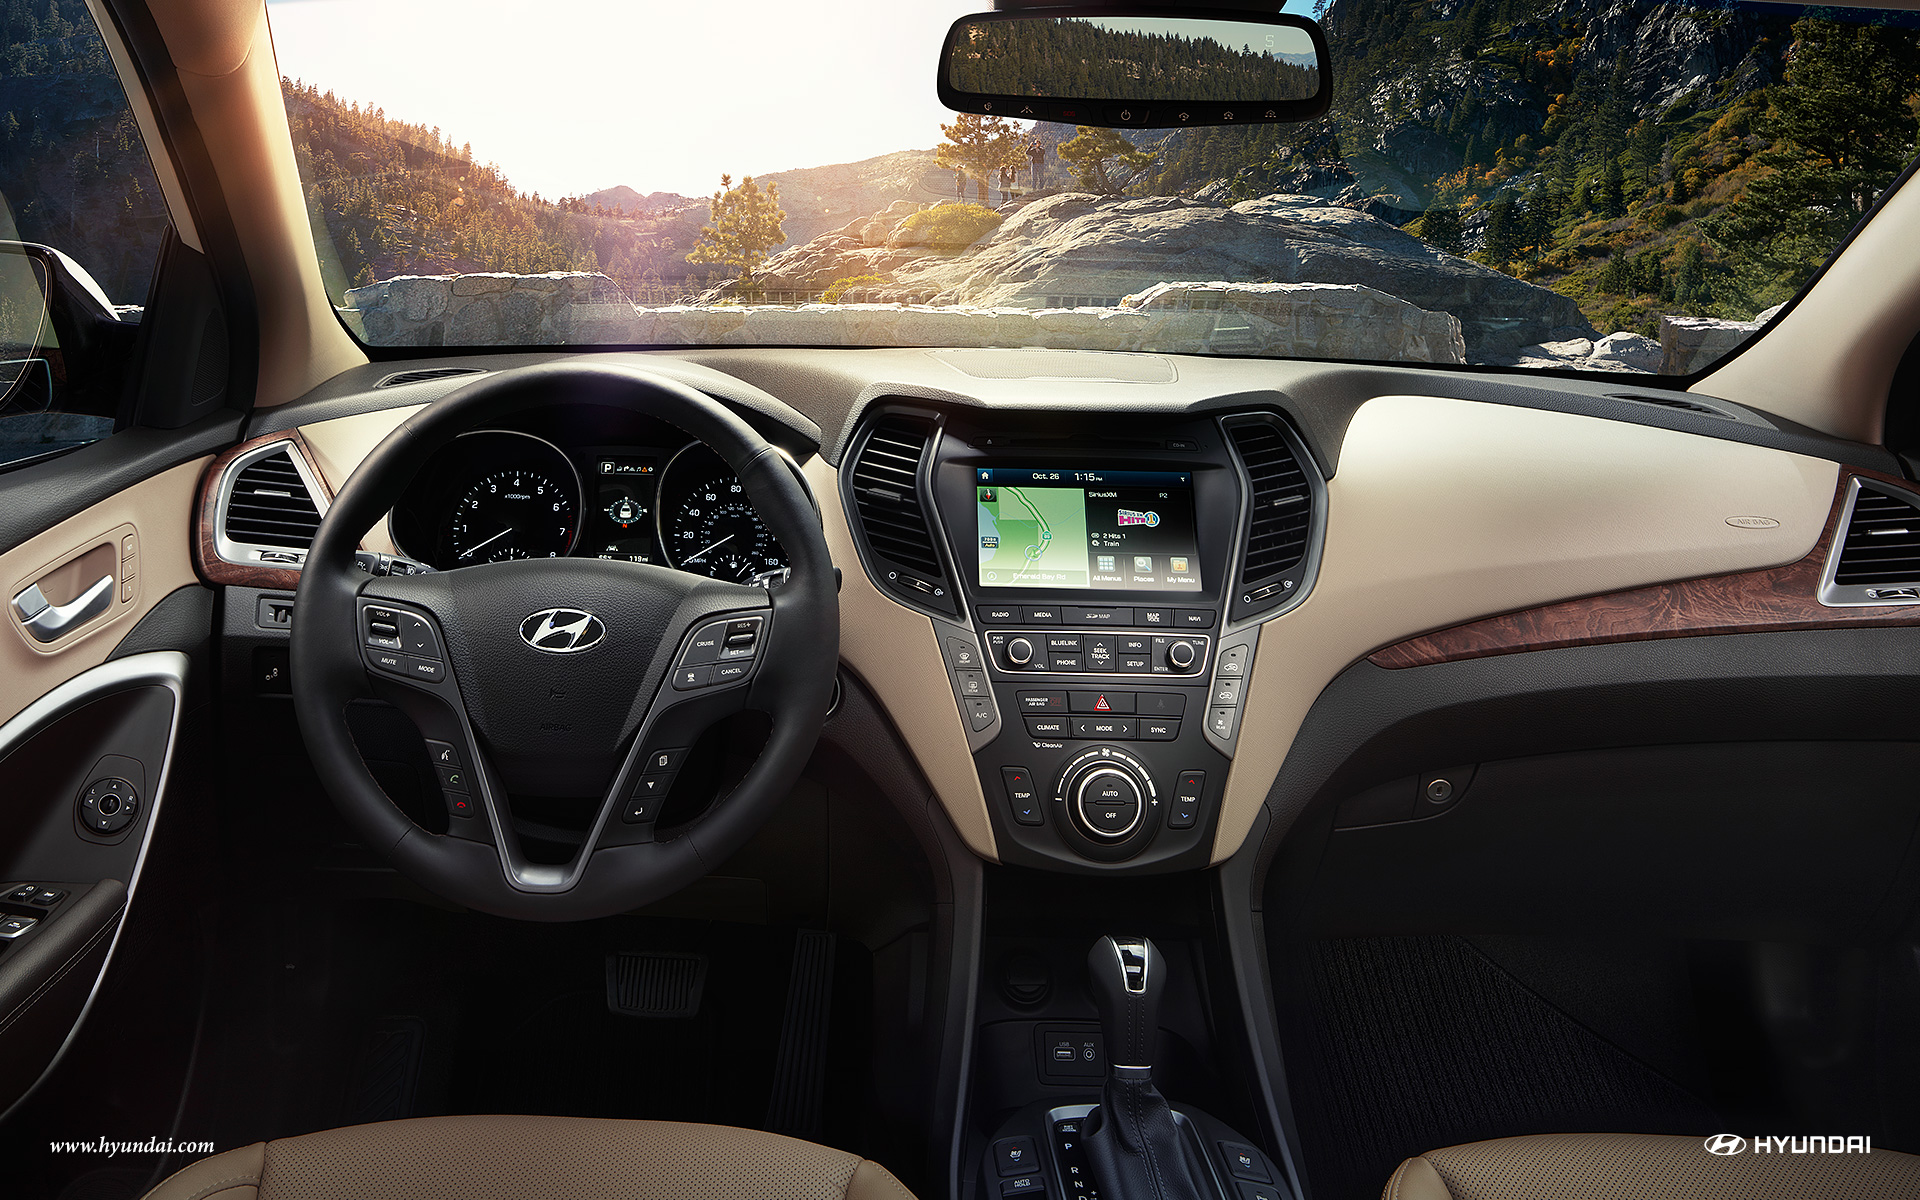 2017 Hyundai Santa Fe Interior Lightbox